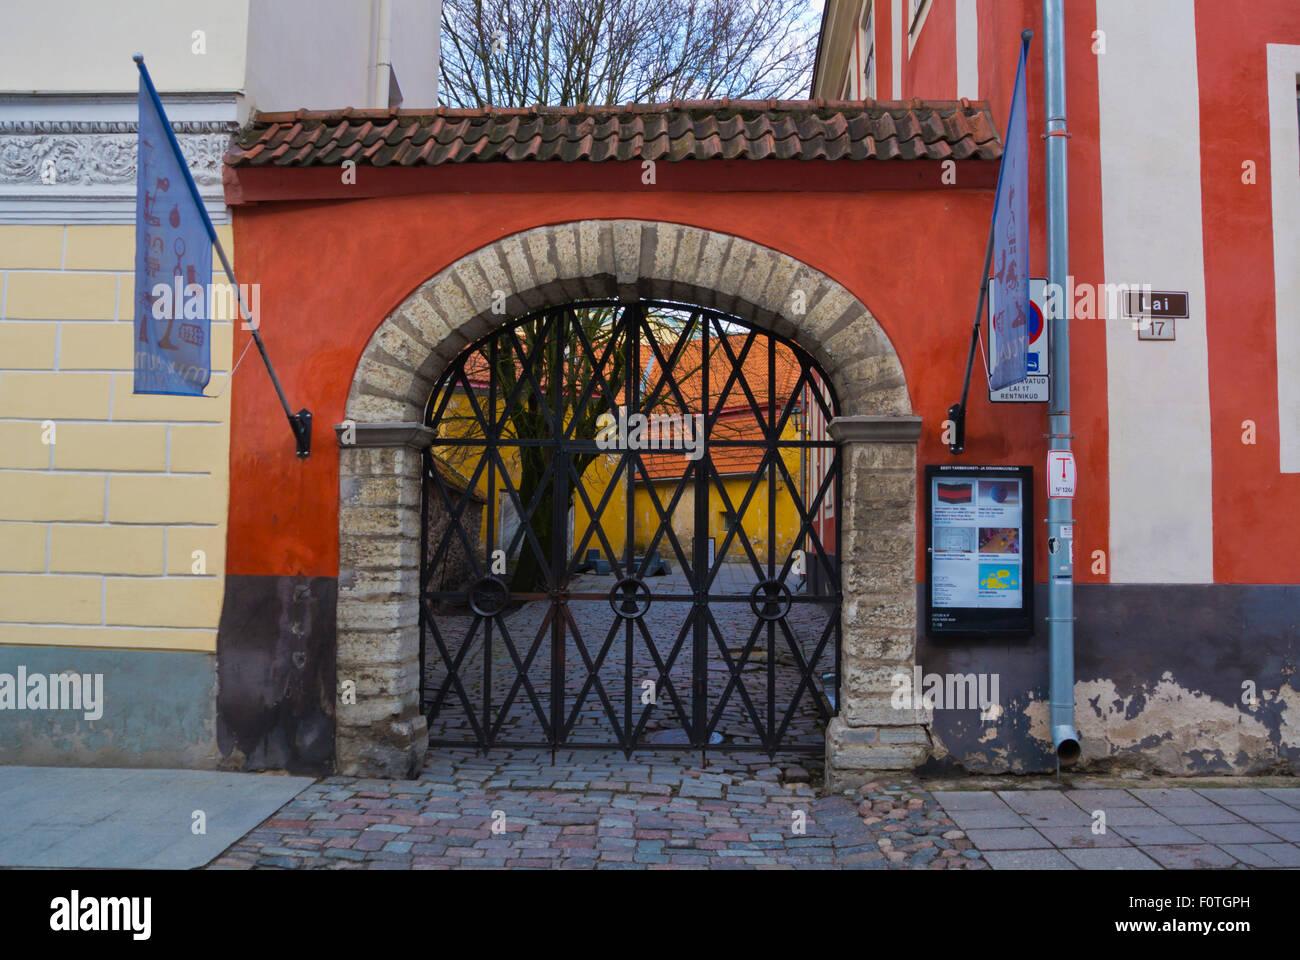 Estonian museum of applied arts and design, Lai street, old town, Tallinn, Estonia, northern Europe - Stock Image